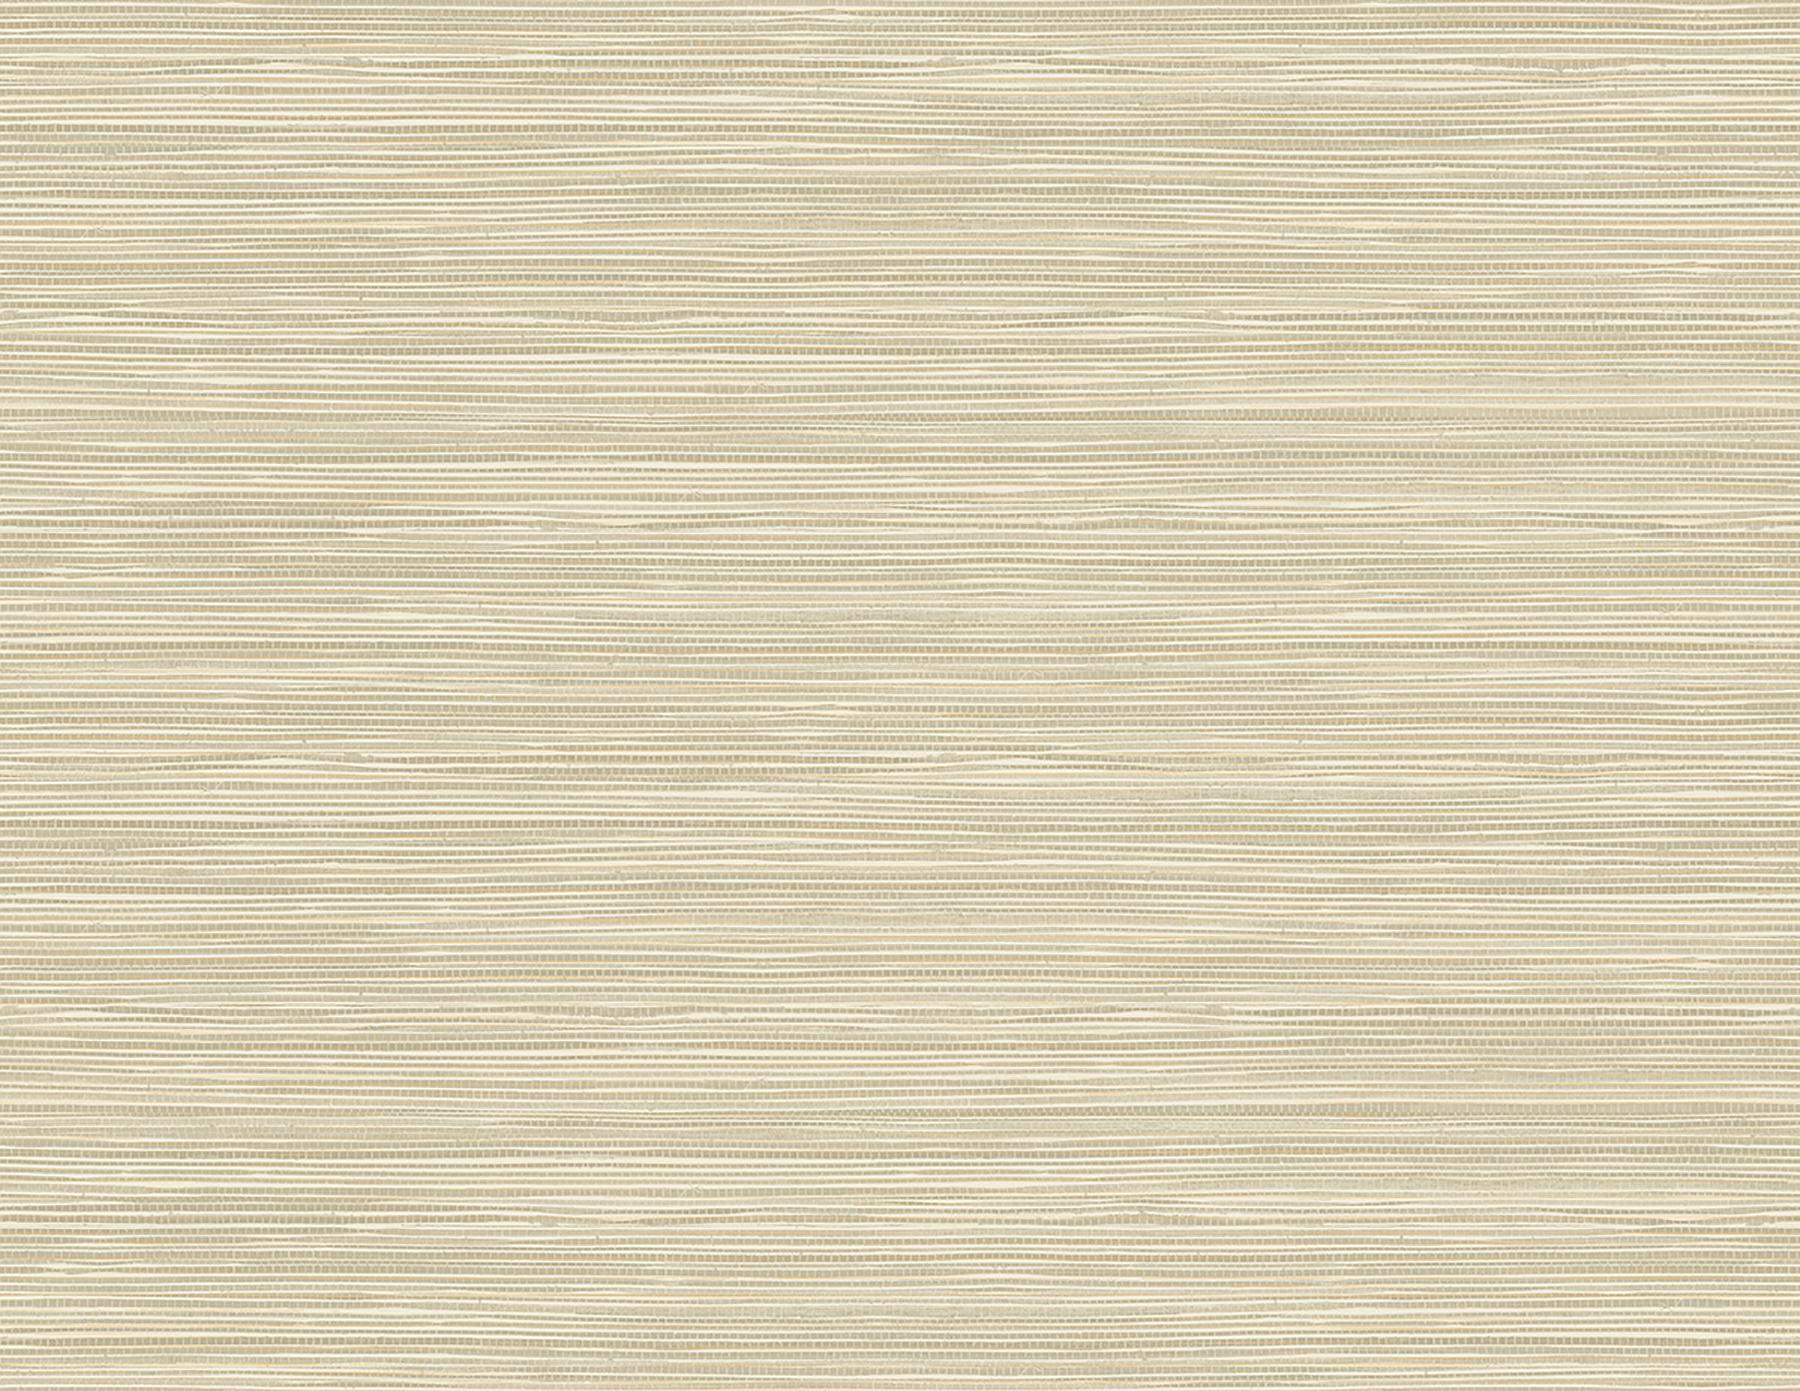 Picture of Bondi Neutral Grasscloth Texture Wallpaper